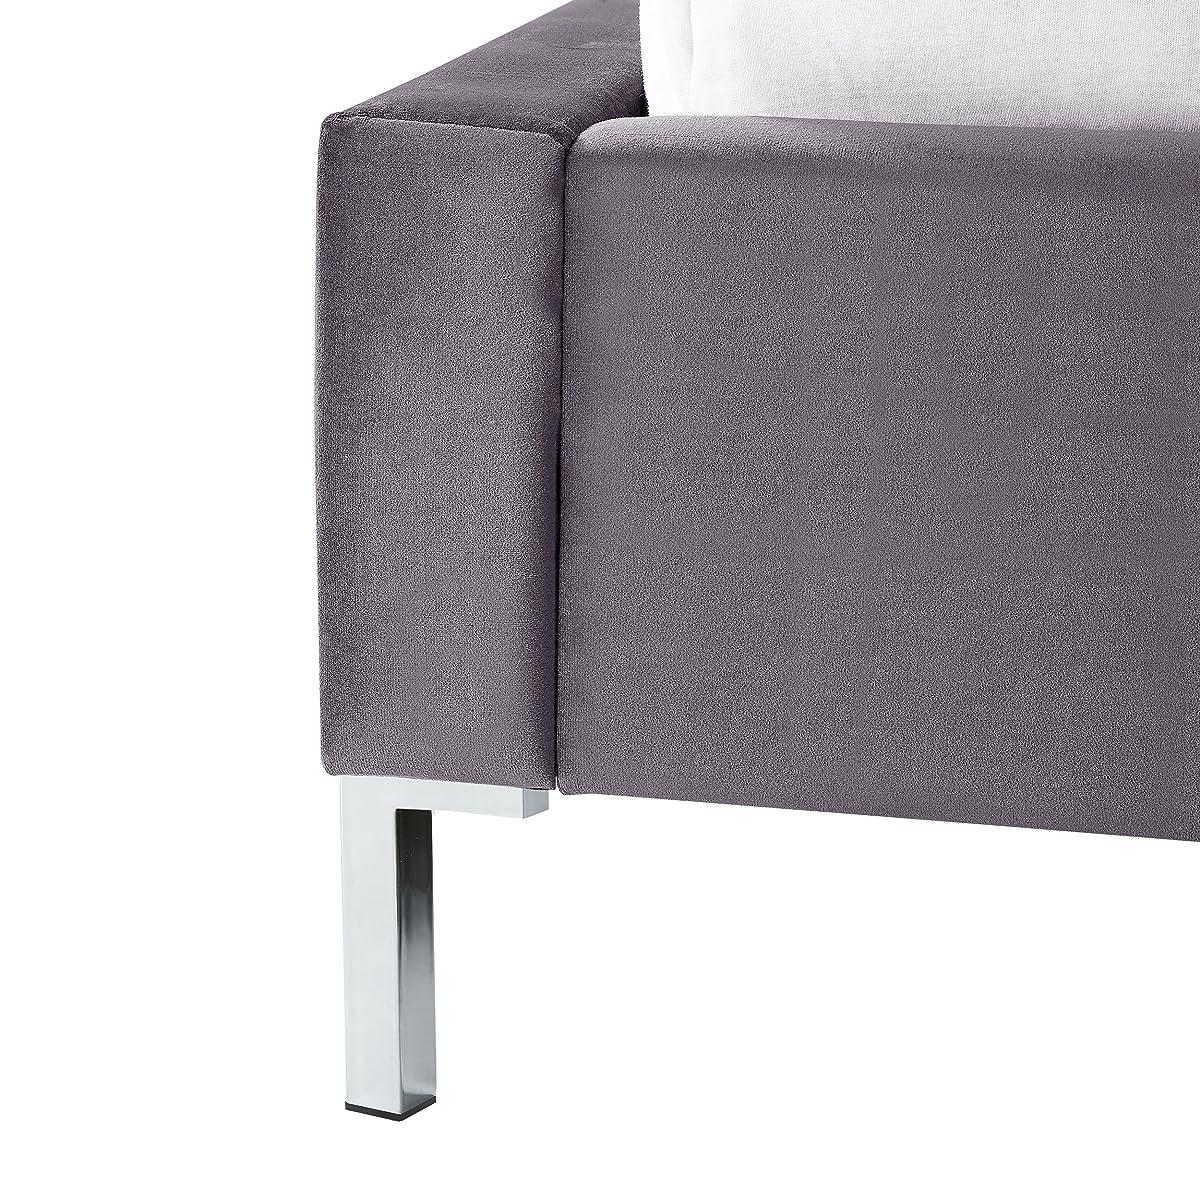 InspiredHome Grey Velvet Platform Bedframe – Design: Leonardo | King Size | Tufted | Modern | Nailhead Trim Finish